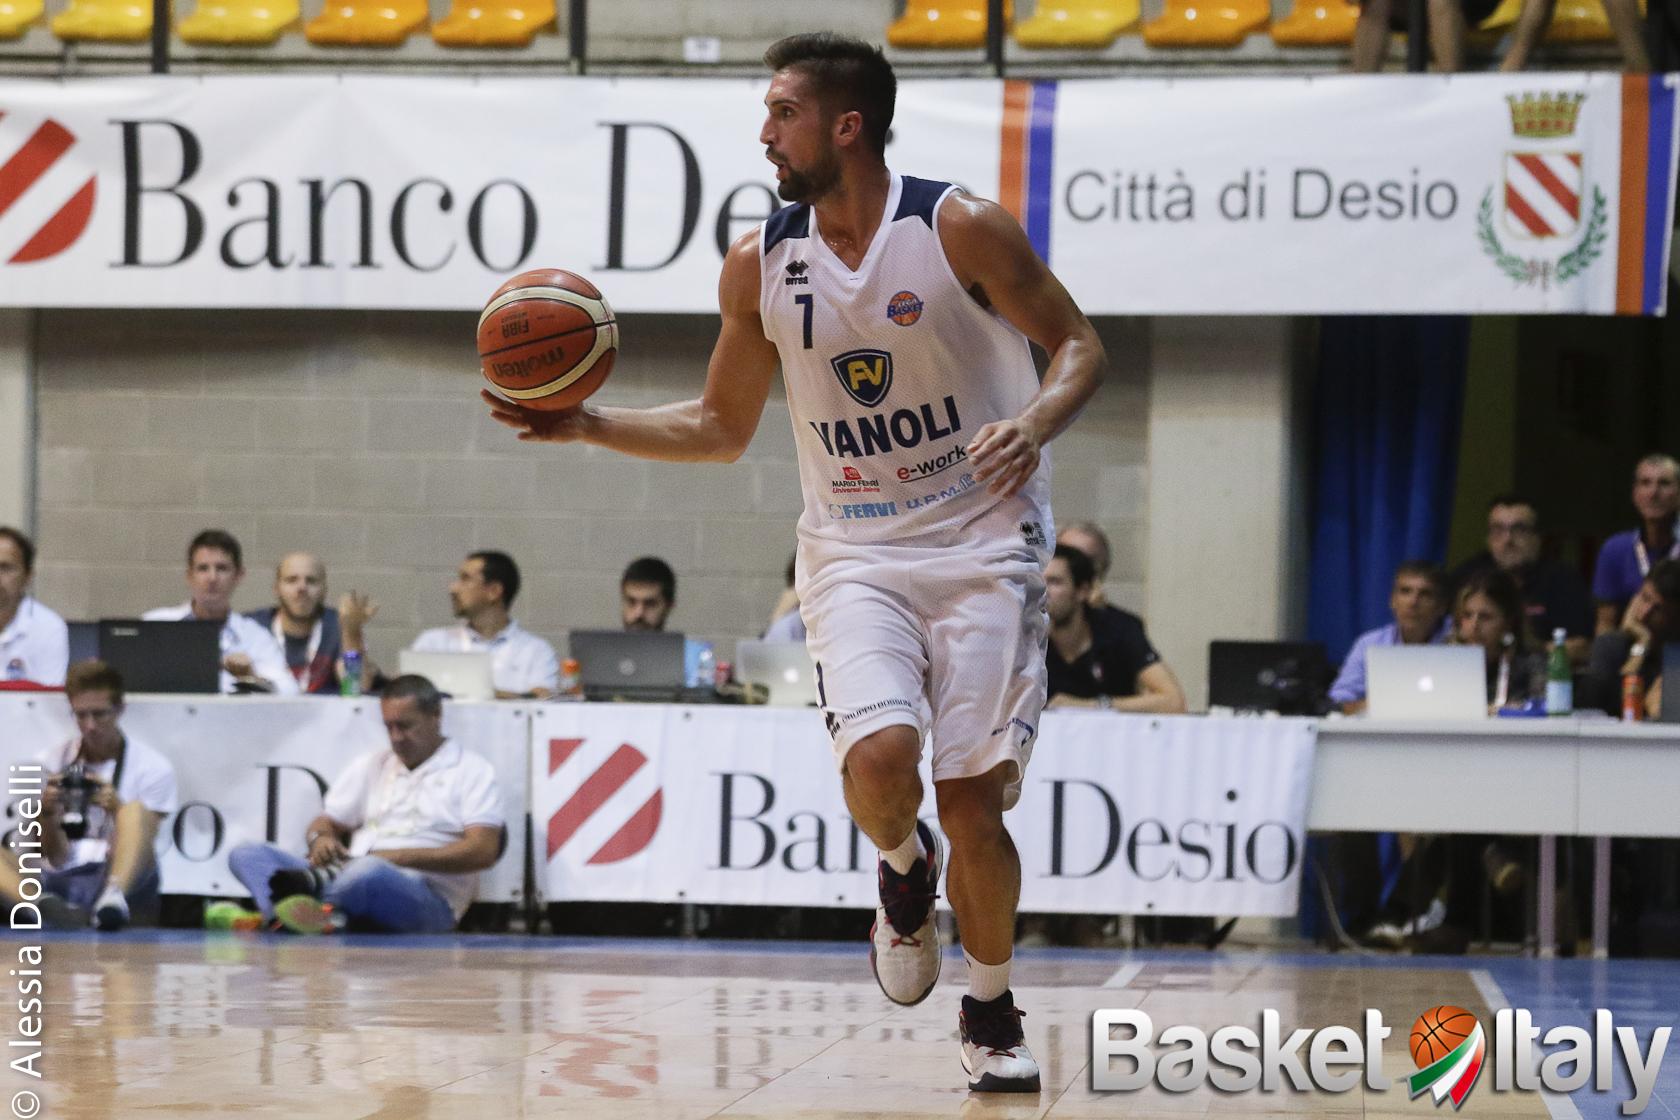 UFFICIALE: Trieste firma Fabio Mian